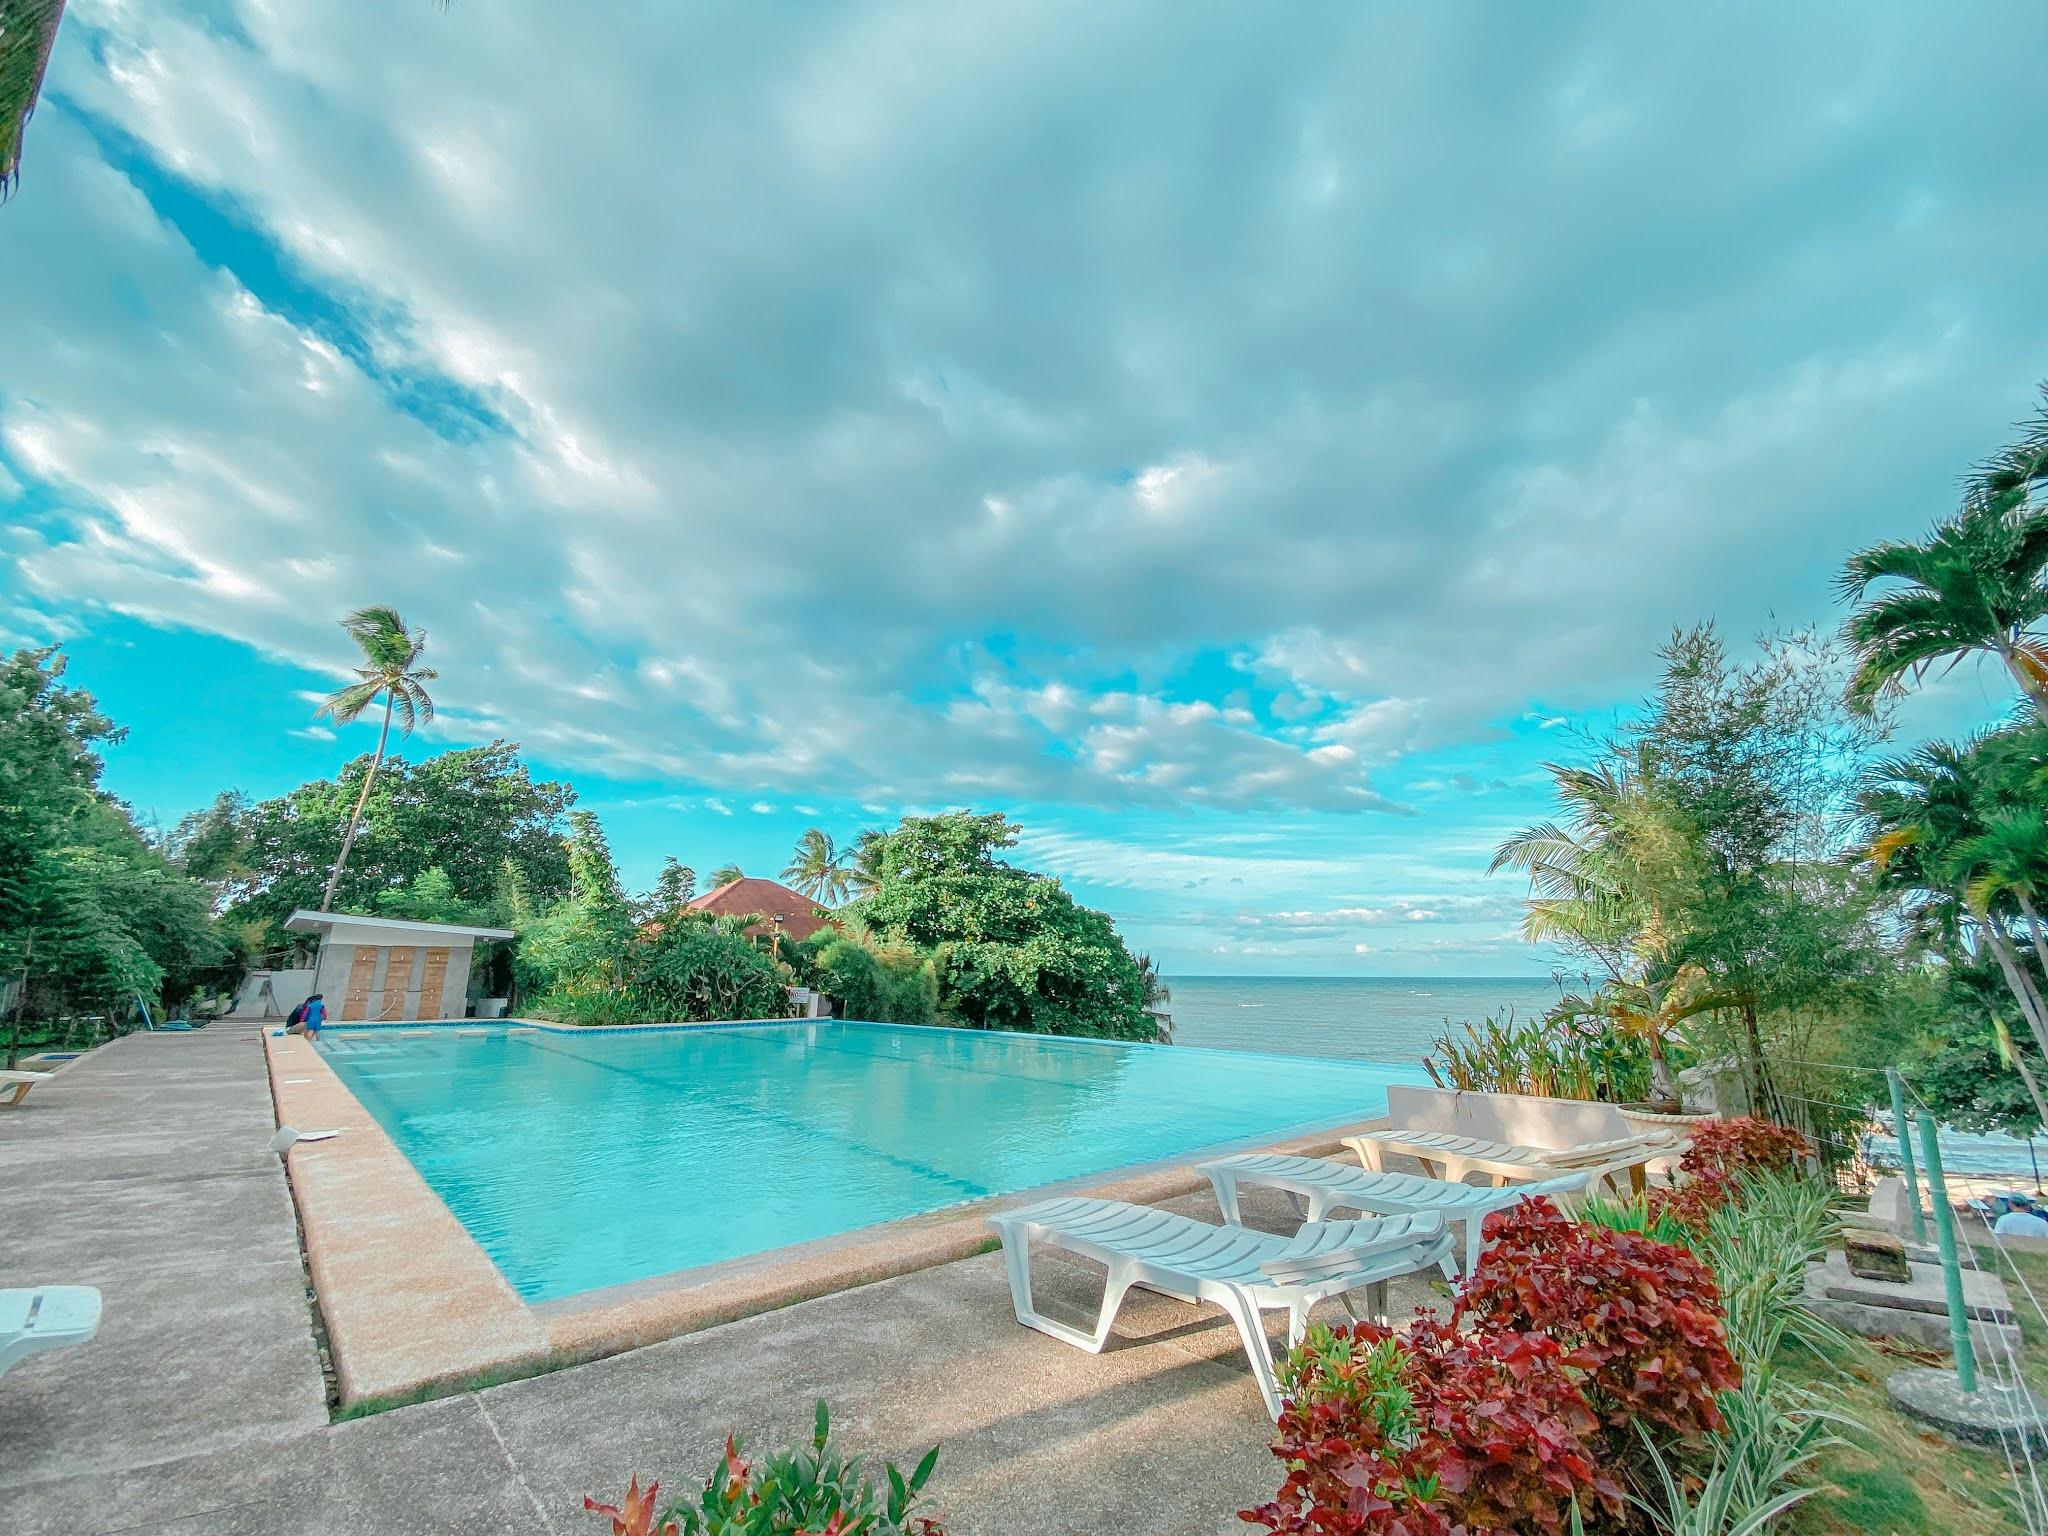 Elegant Beach Resort in San Remegio, Cebu